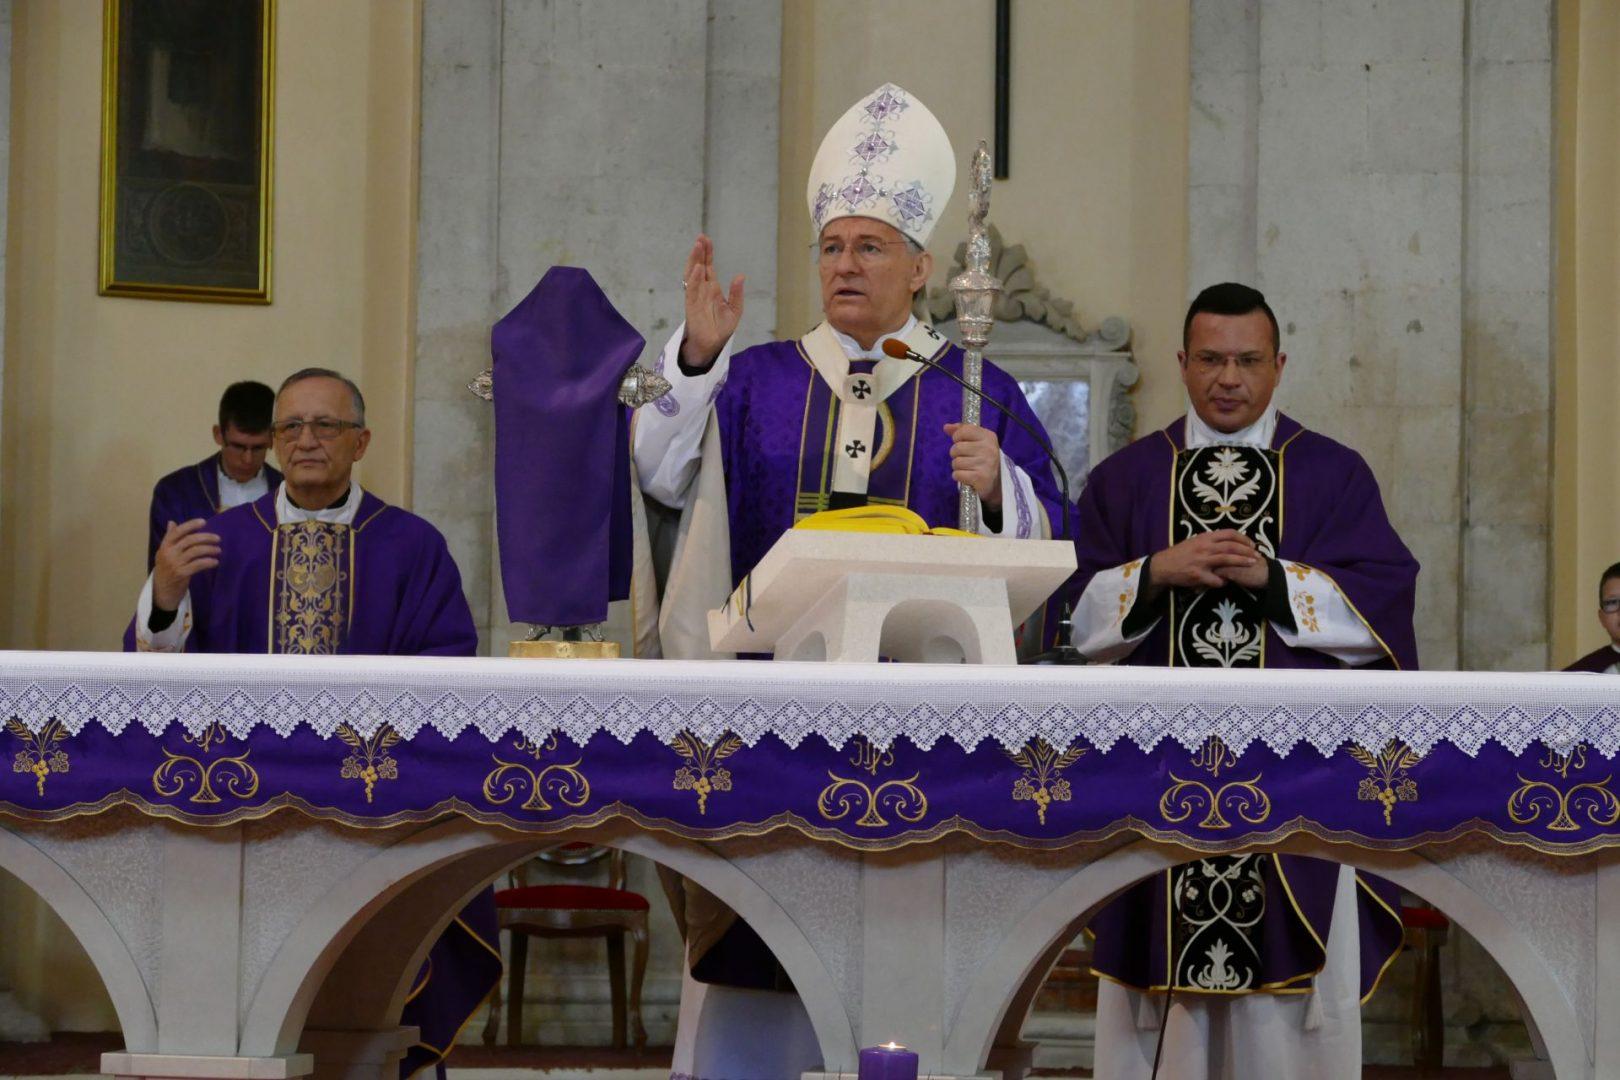 Misa posvete ulja, Vazmeno trodnevlje i Uskrs u splitskoj katedrali